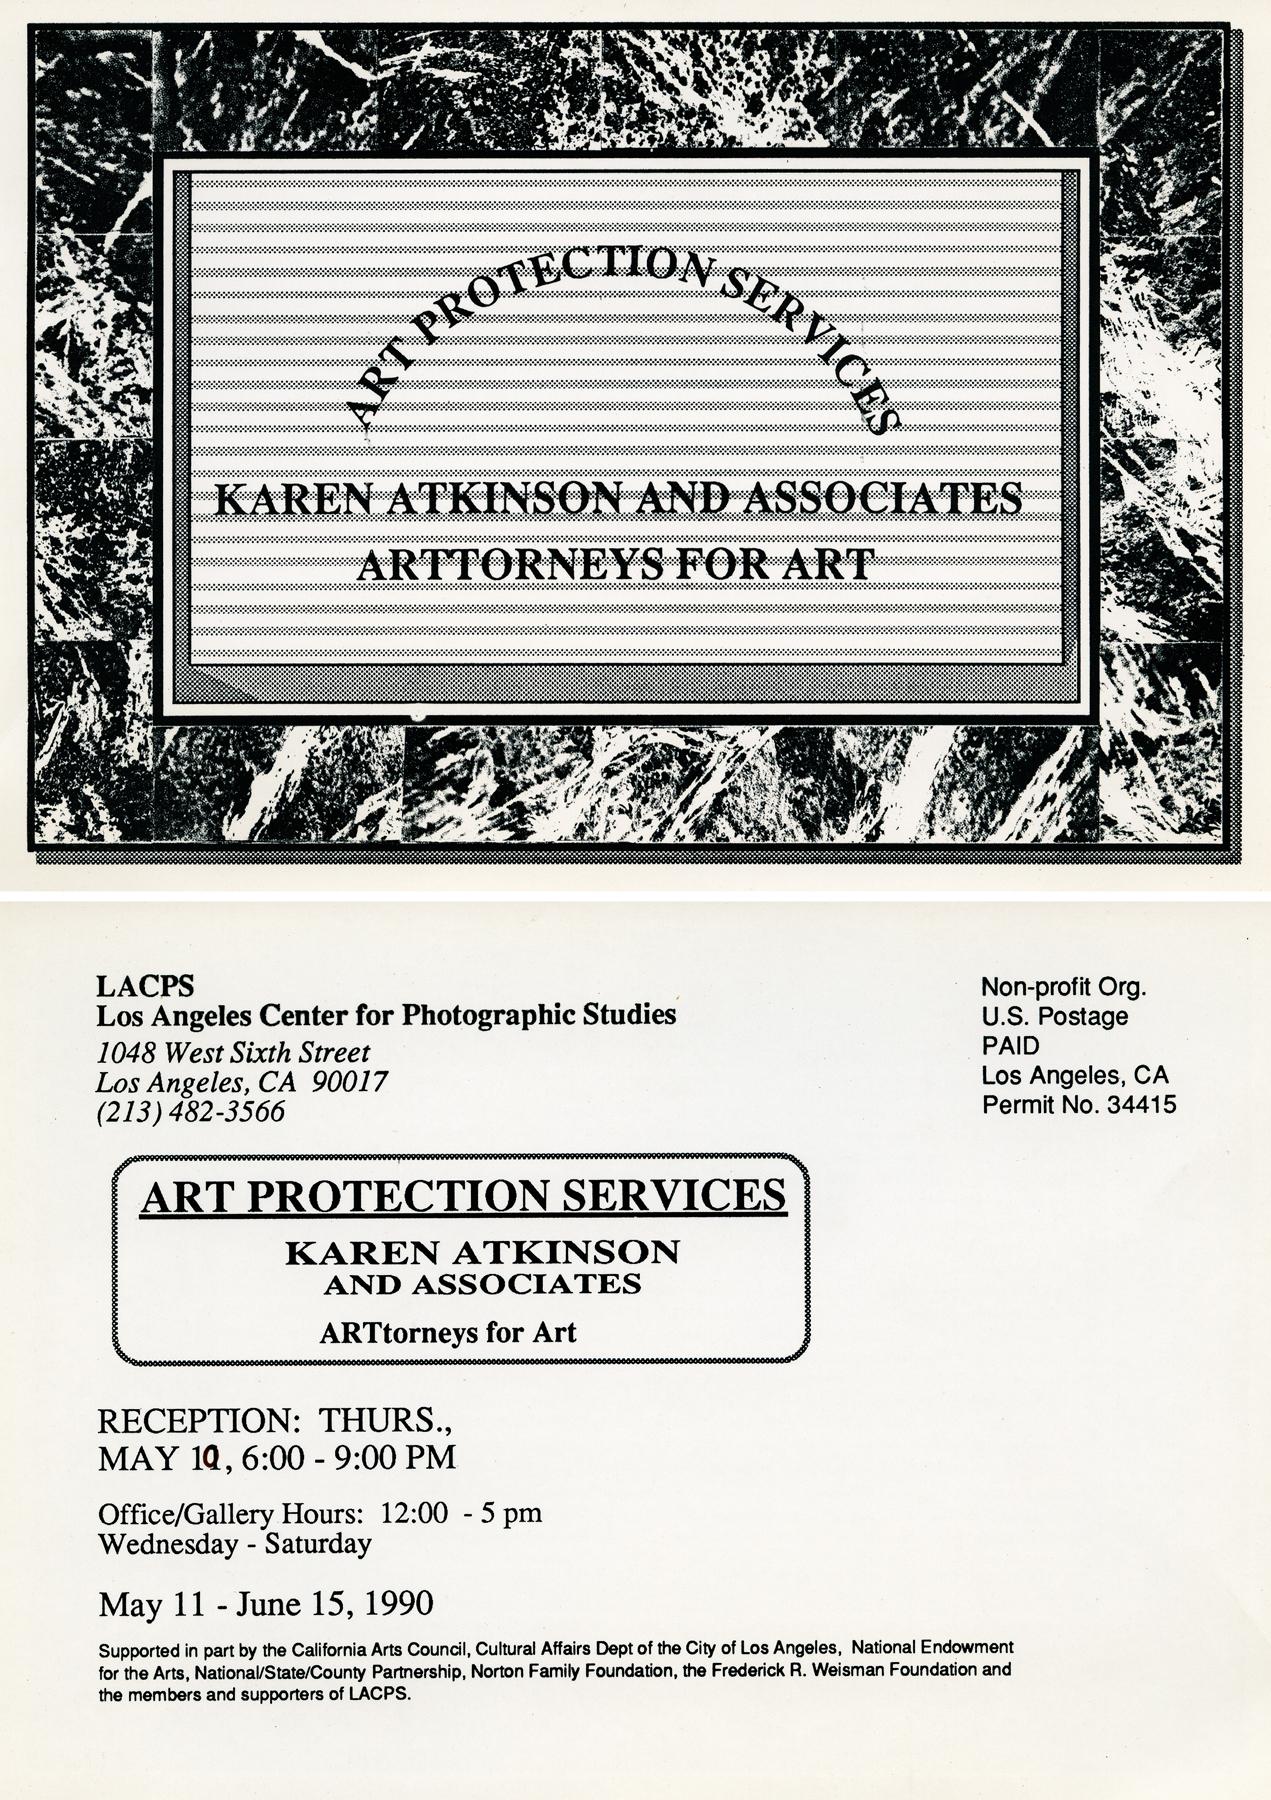 ART PROTECTION SERVICES: Karen Atkinson and Associates, ARTtorneys At Work. Exhibition Invite.